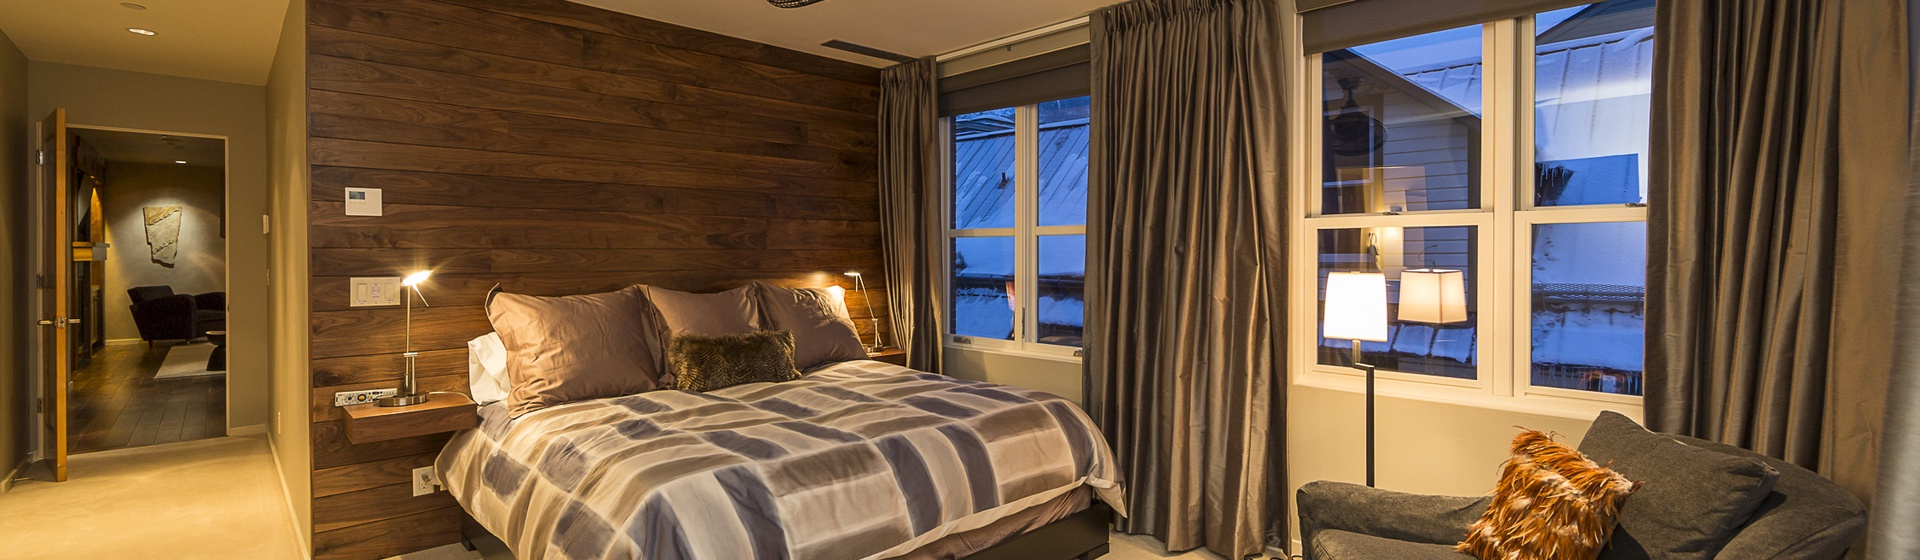 26-Telluride-Trulux-Penthouse-MasterBedroom.jpg